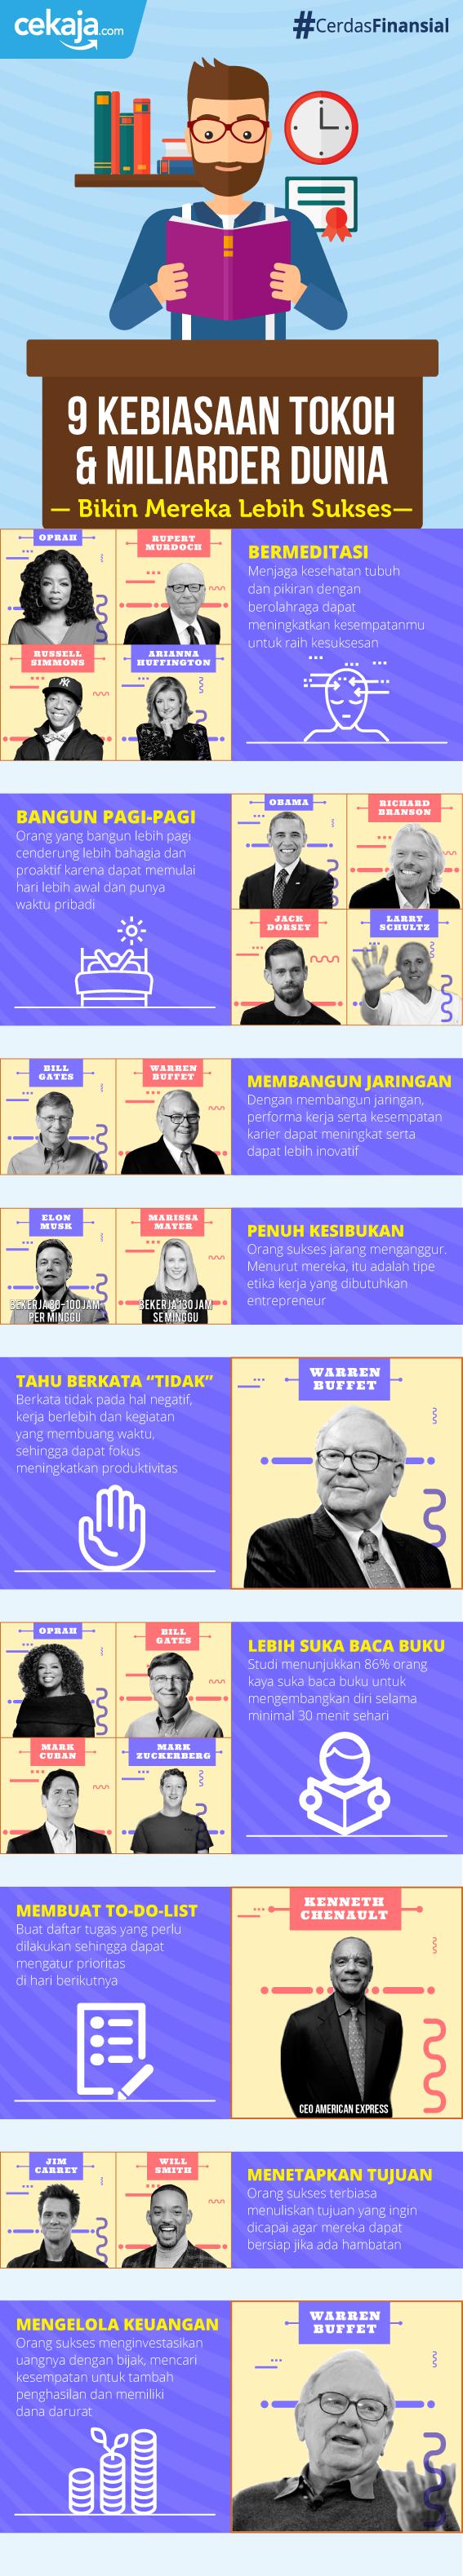 infografis-kebiasaan-miliarder- CekAja.com